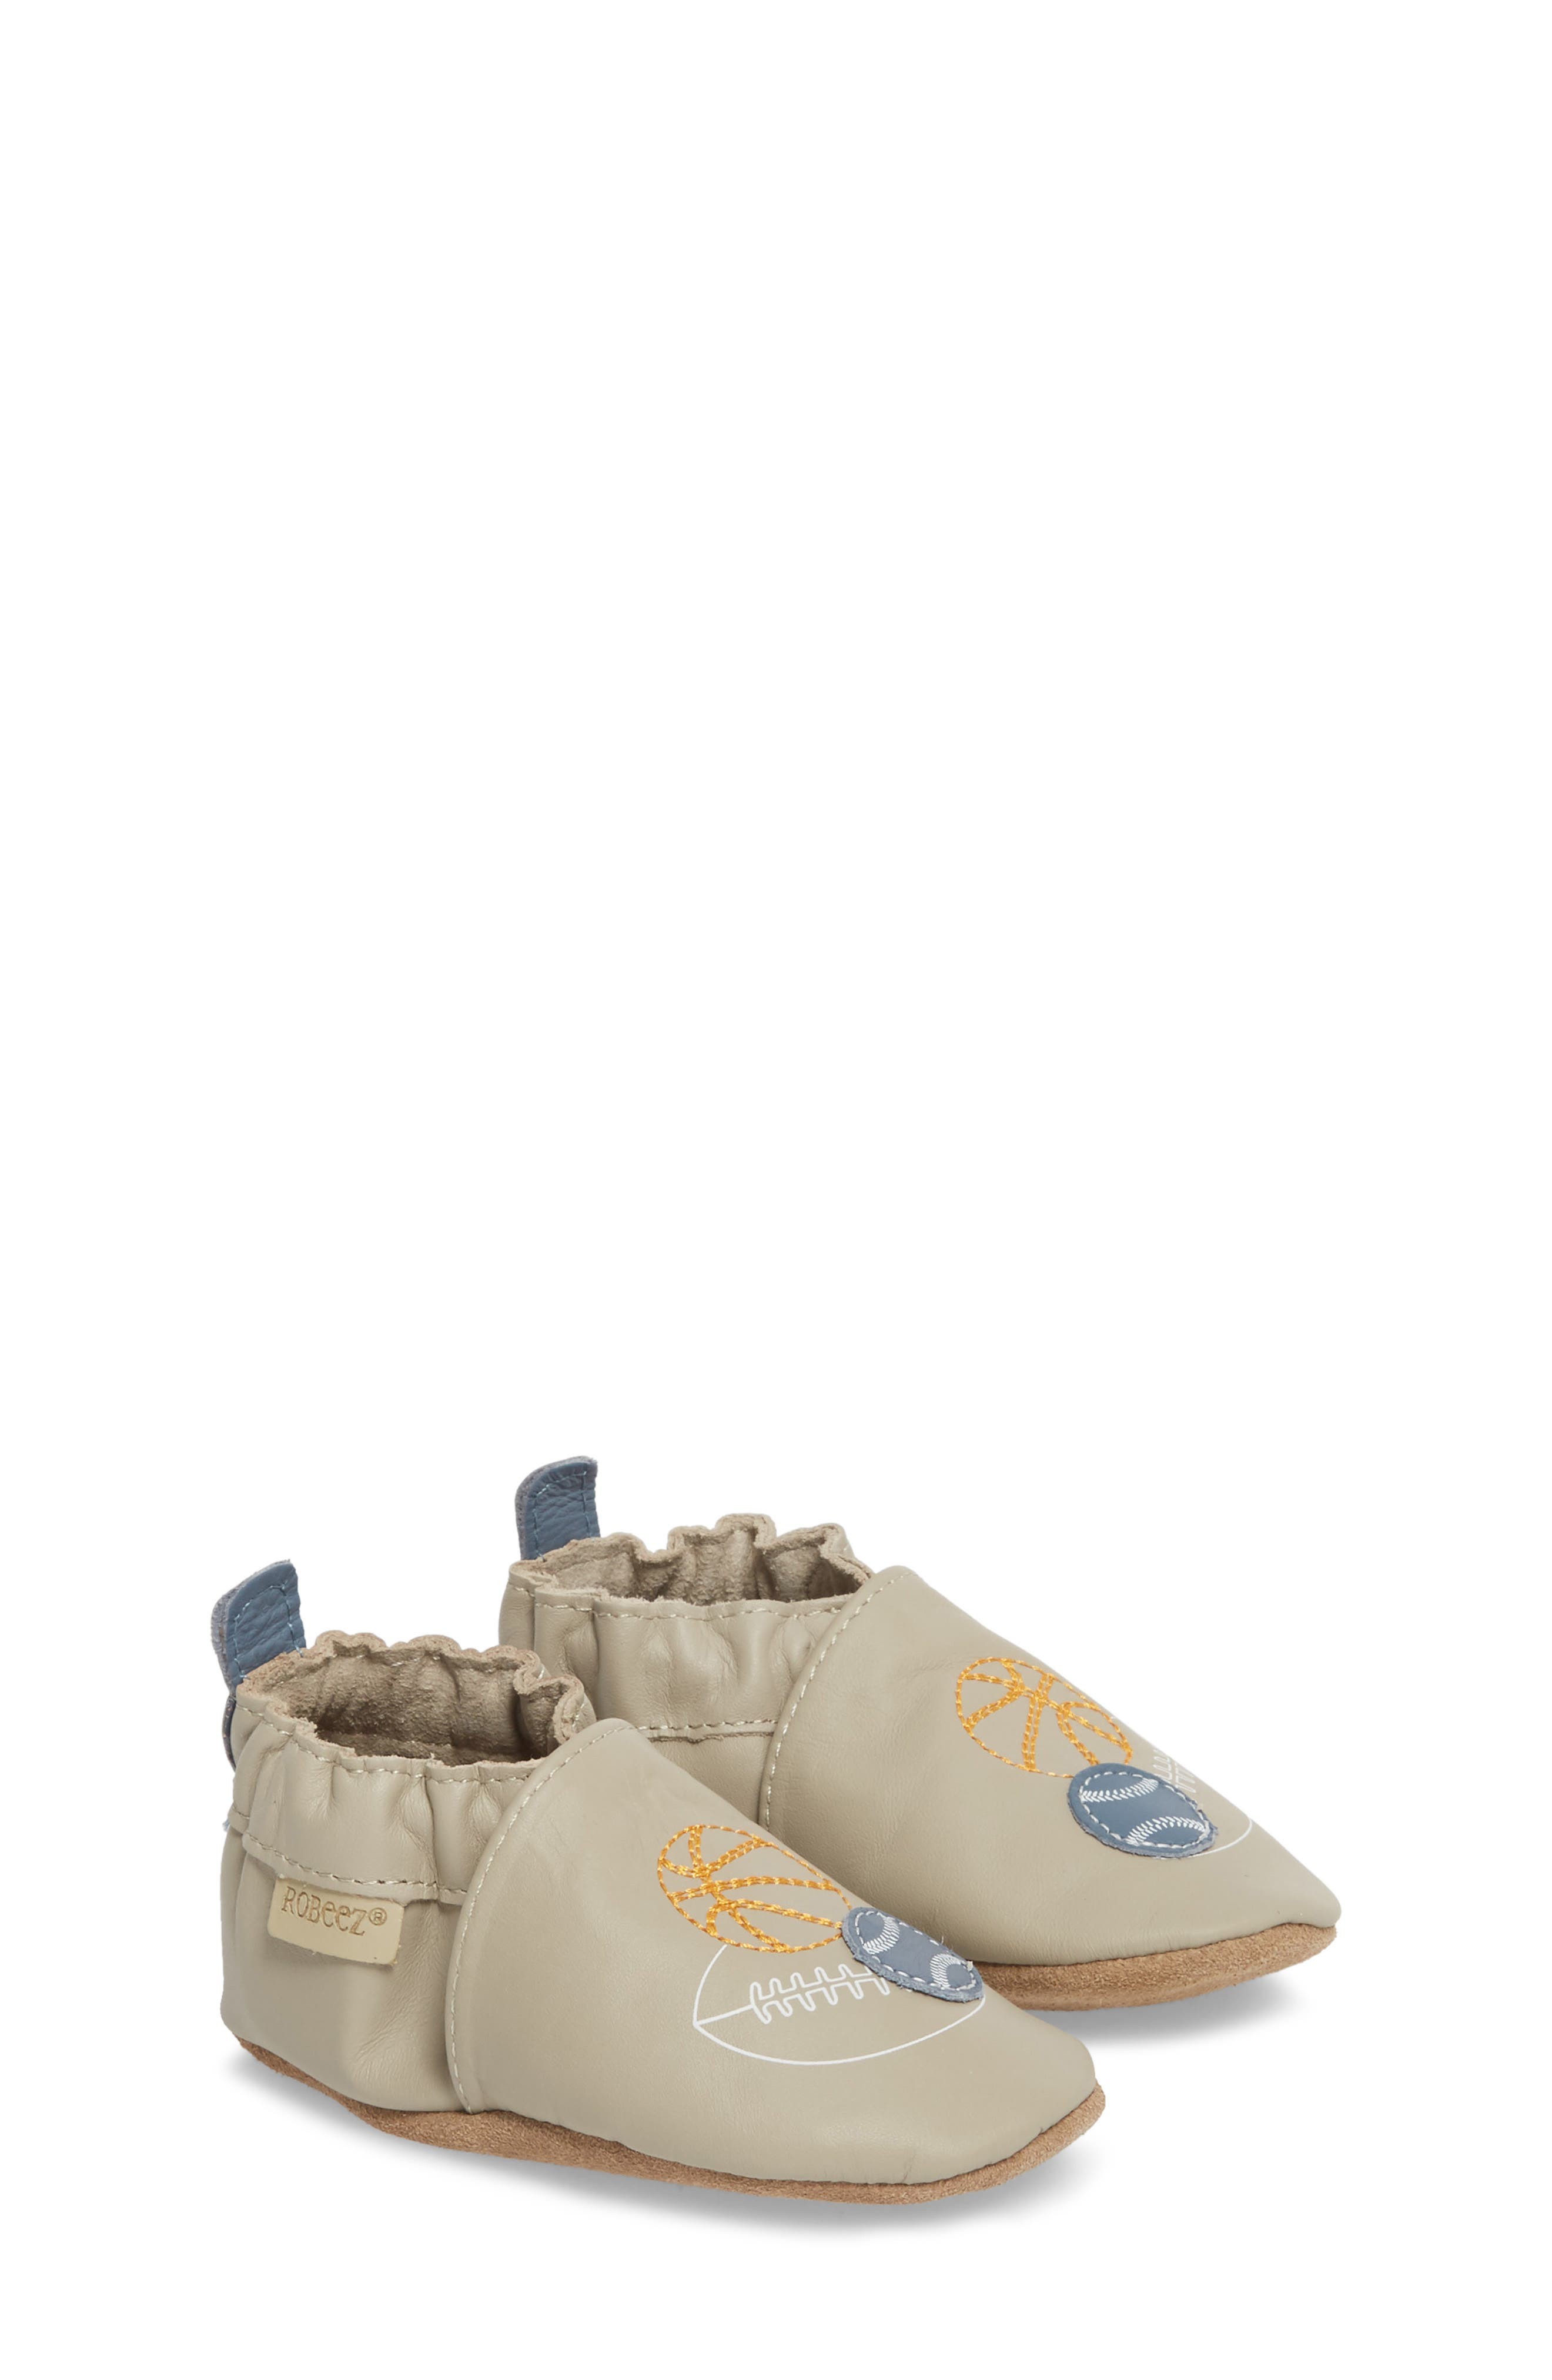 Dream Big Moccasin Crib Shoe,                             Alternate thumbnail 3, color,                             Taupe